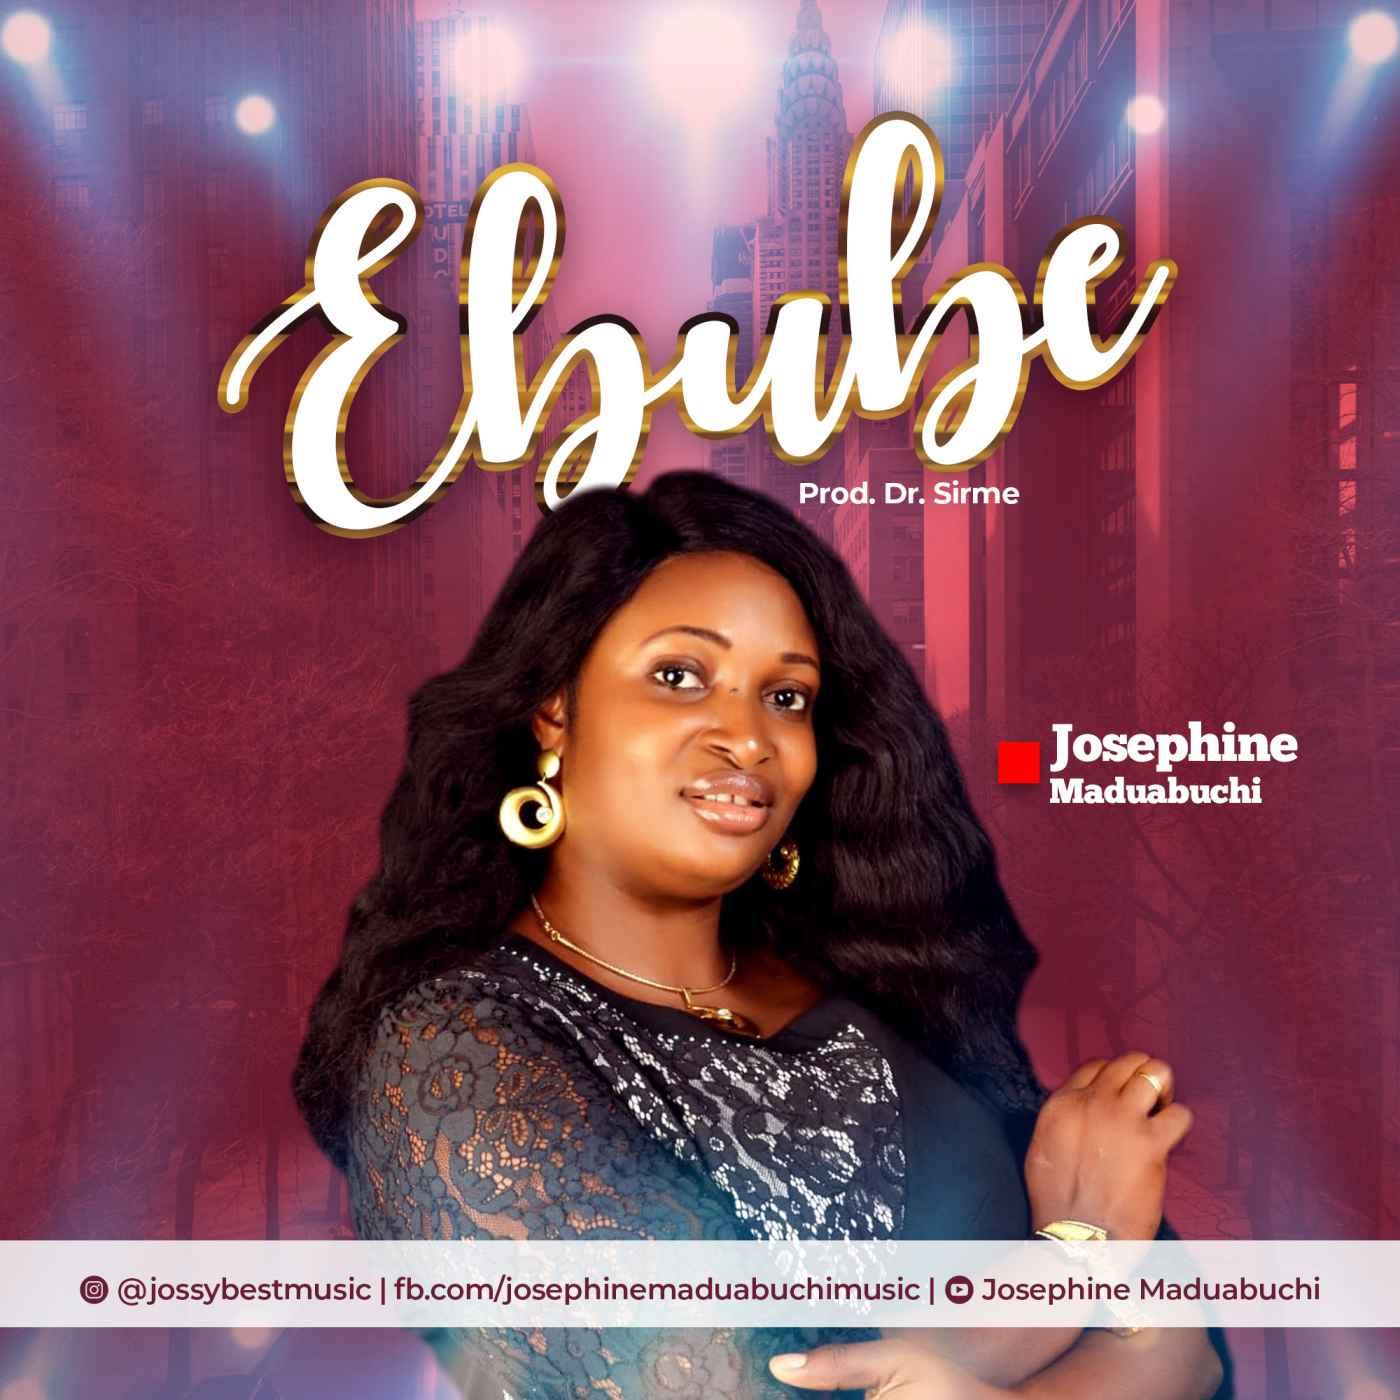 Download Mp3 Josephine - Maduabuchi